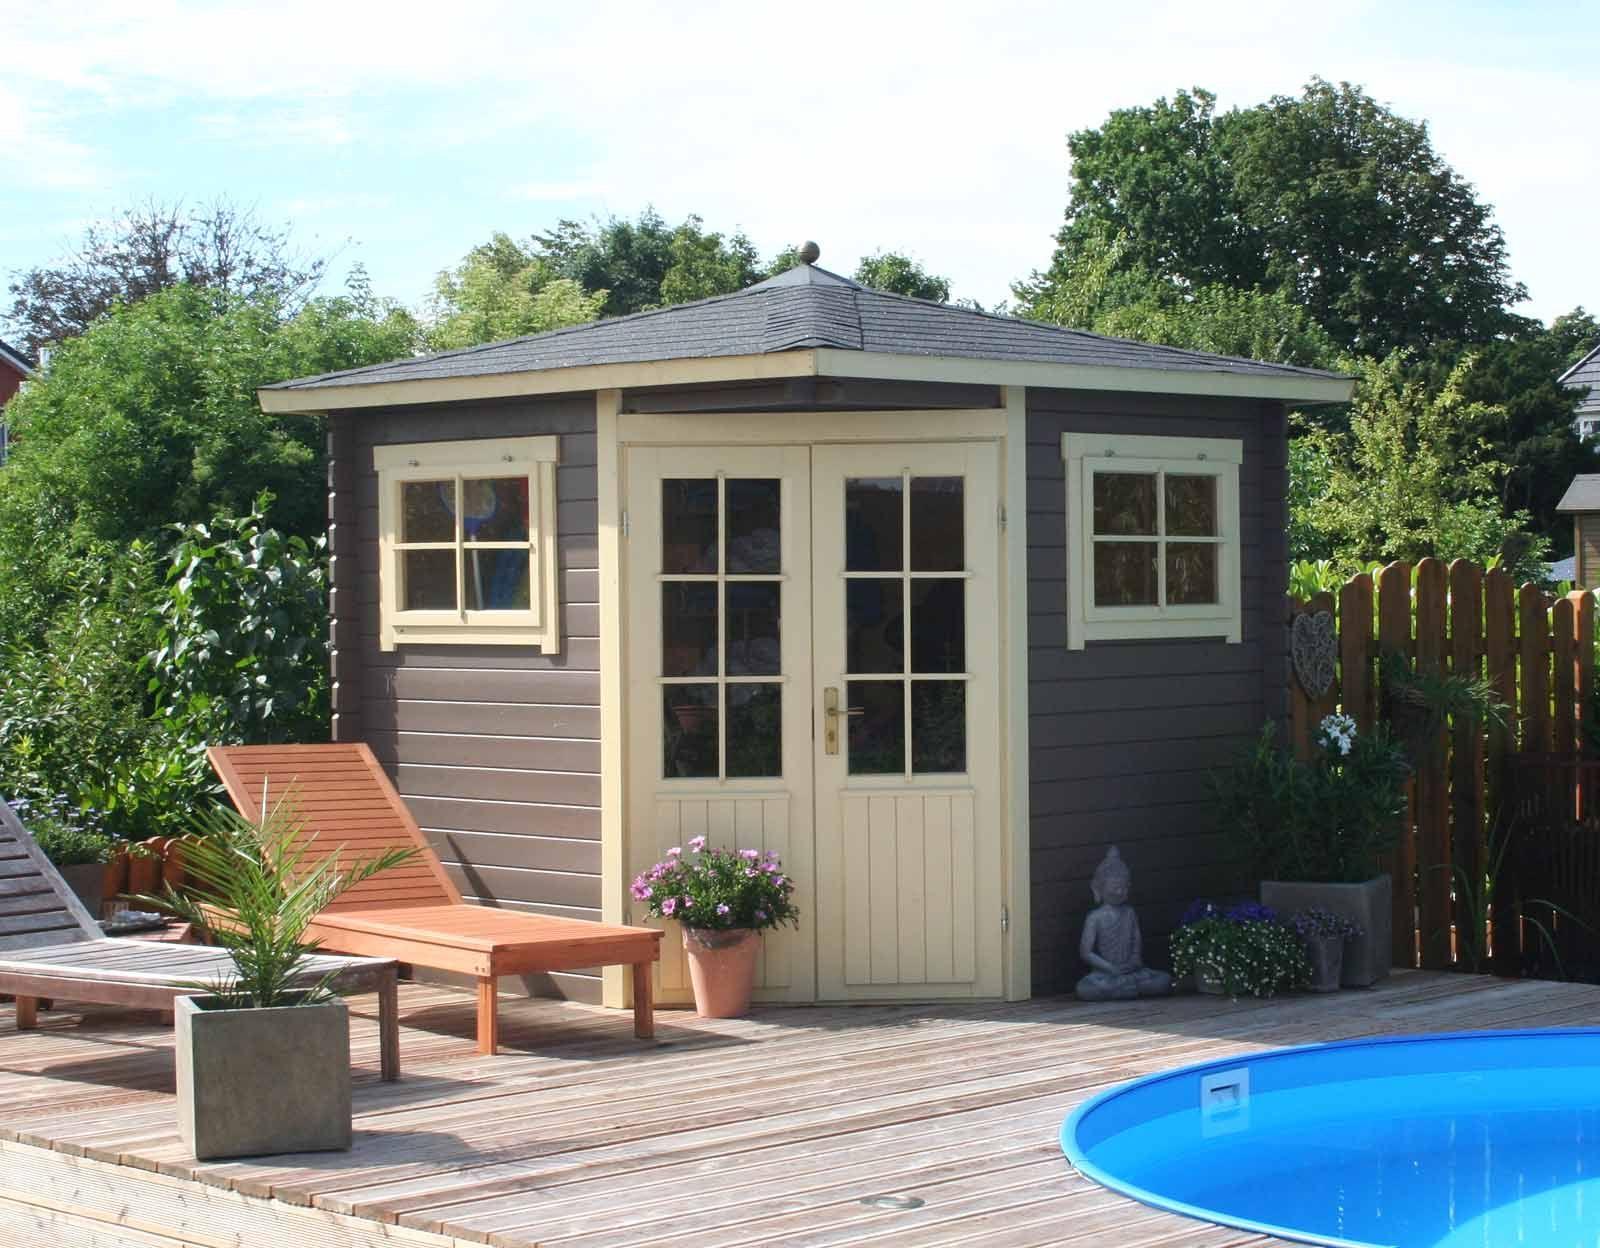 Eck gartenhaus modell sunny b flachdach gartenhäuser und